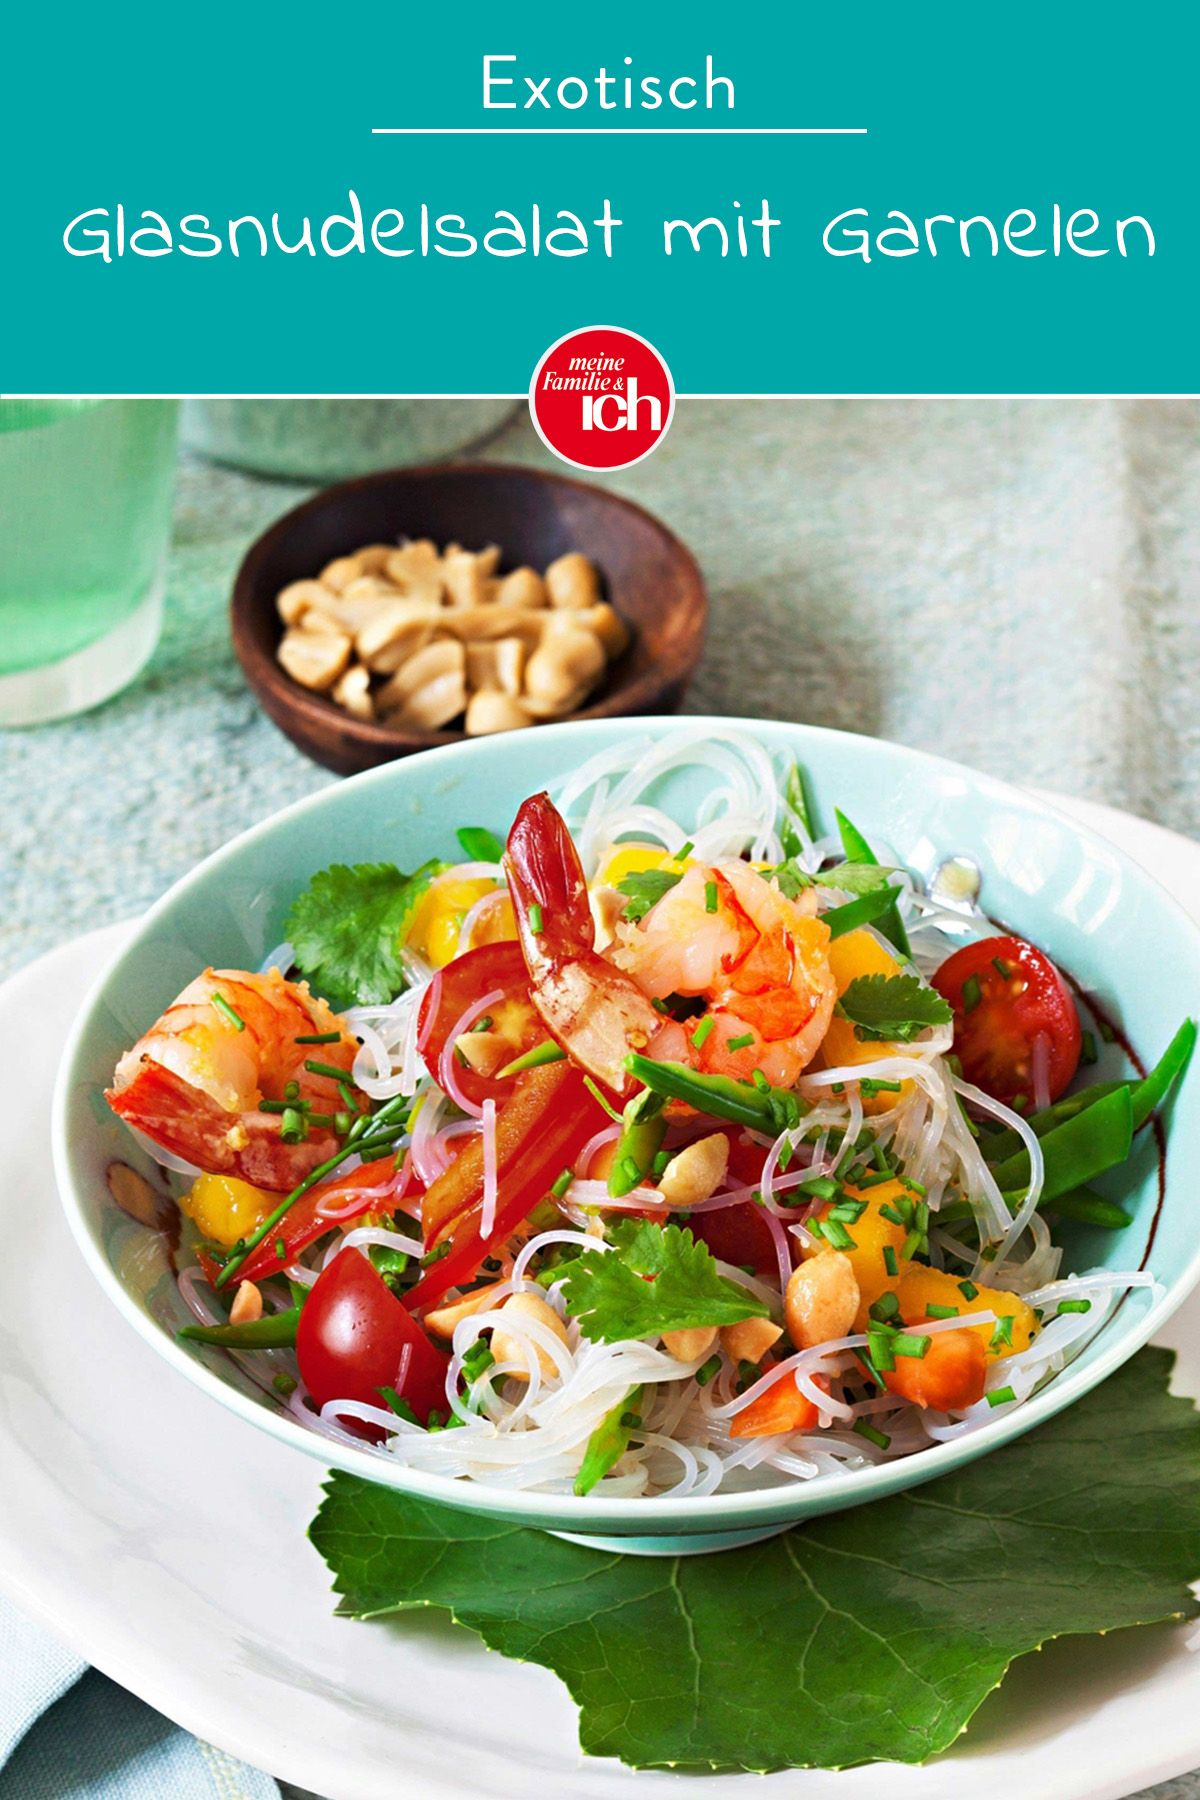 50++ Gebratene garnelen auf salat ideen